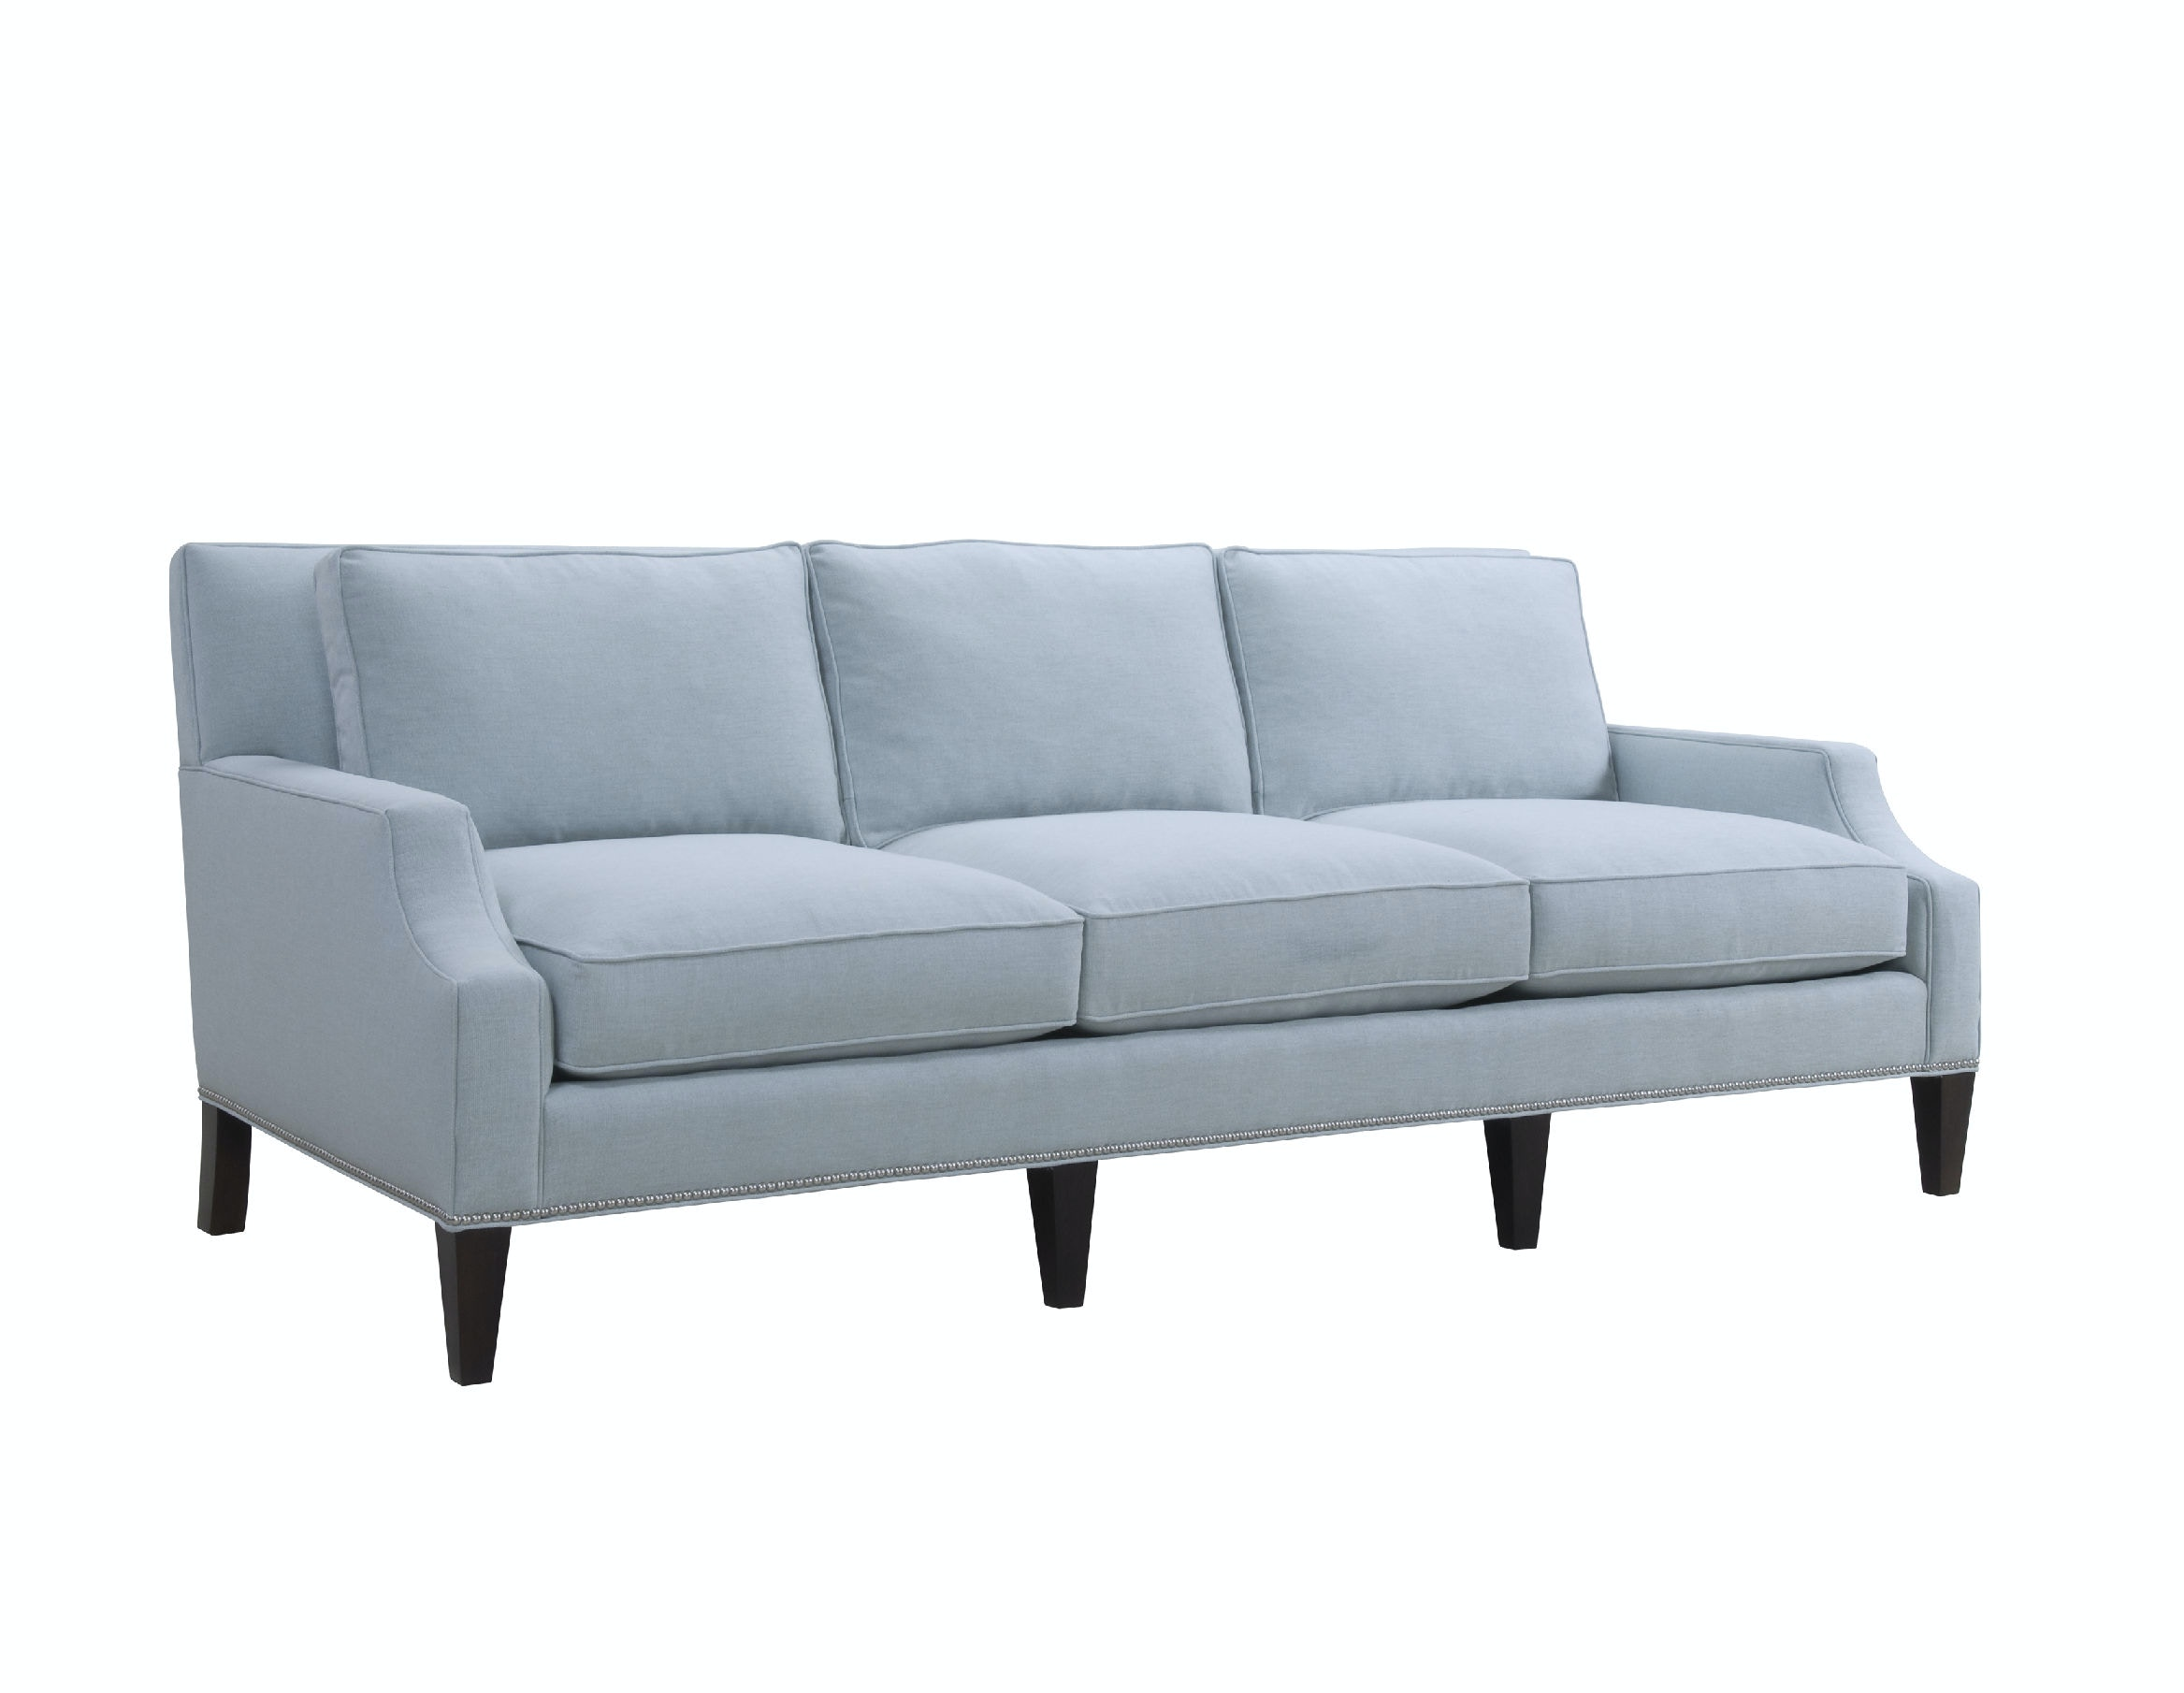 southern furniture gibson sofa ikea stockholm usa stacy select living room 2214 - ...